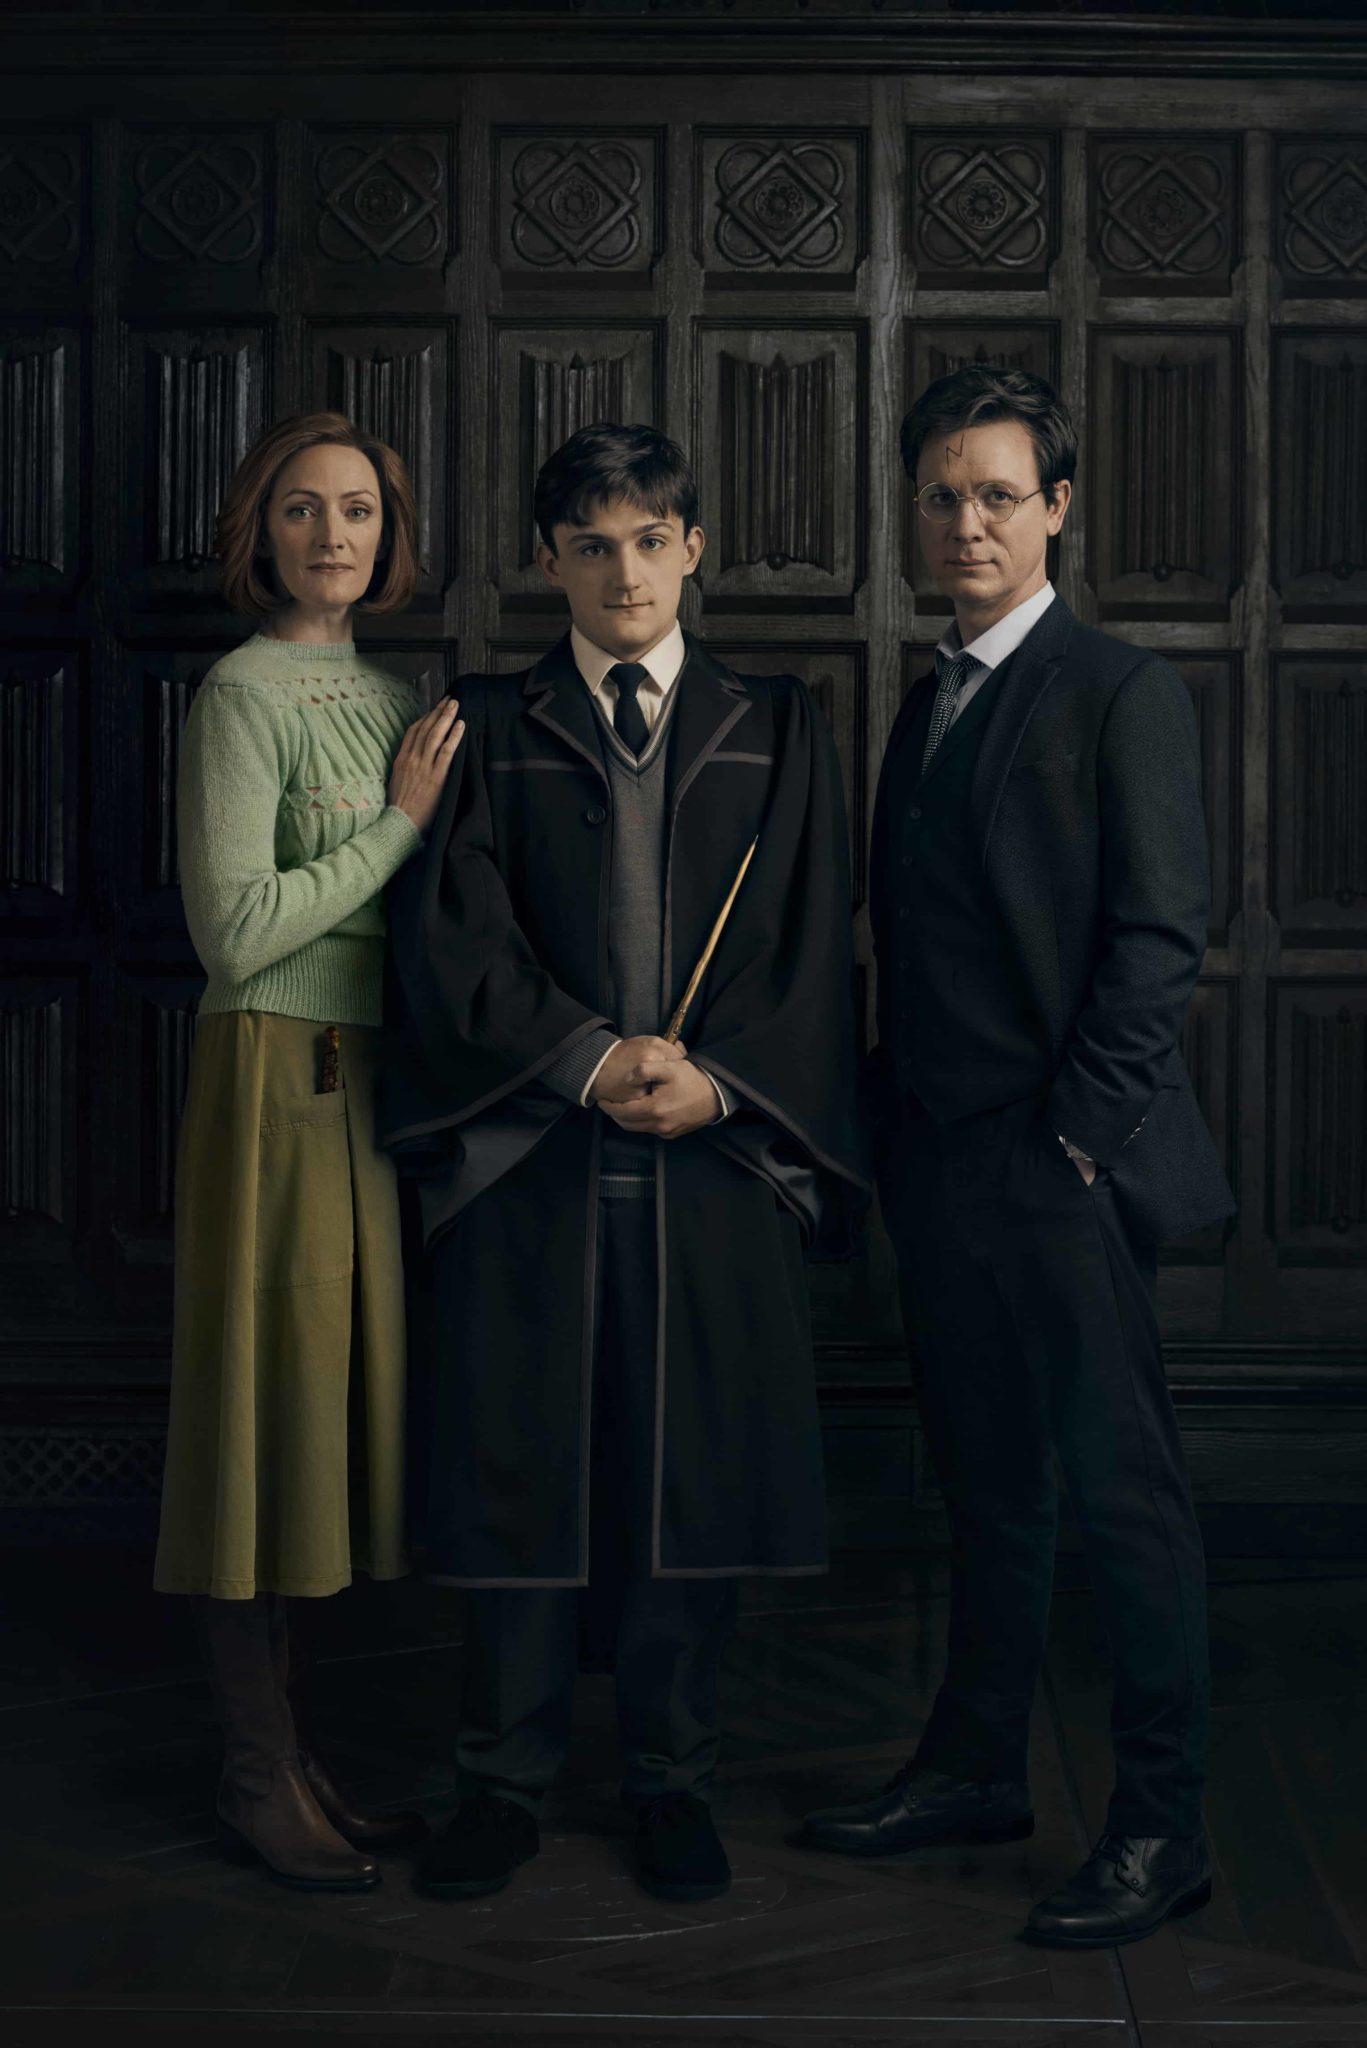 Gina (Susie Trayling), Severus Target (Joe Idris-Roberts) and Harry Potter (Jamie Ballard) in Cursed Child